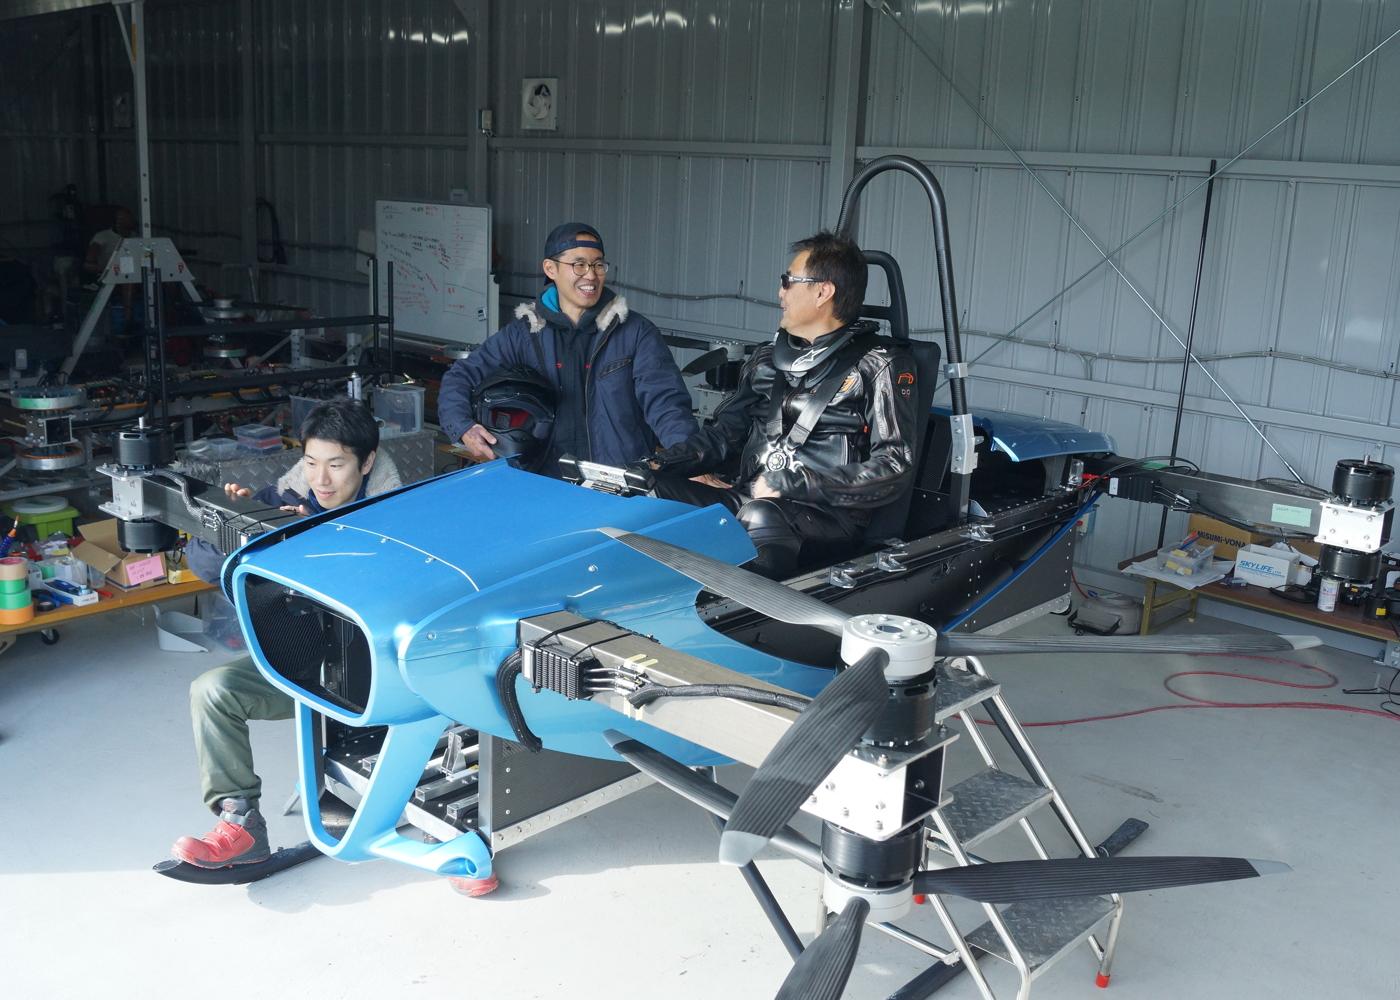 SkyDrive manned test flight